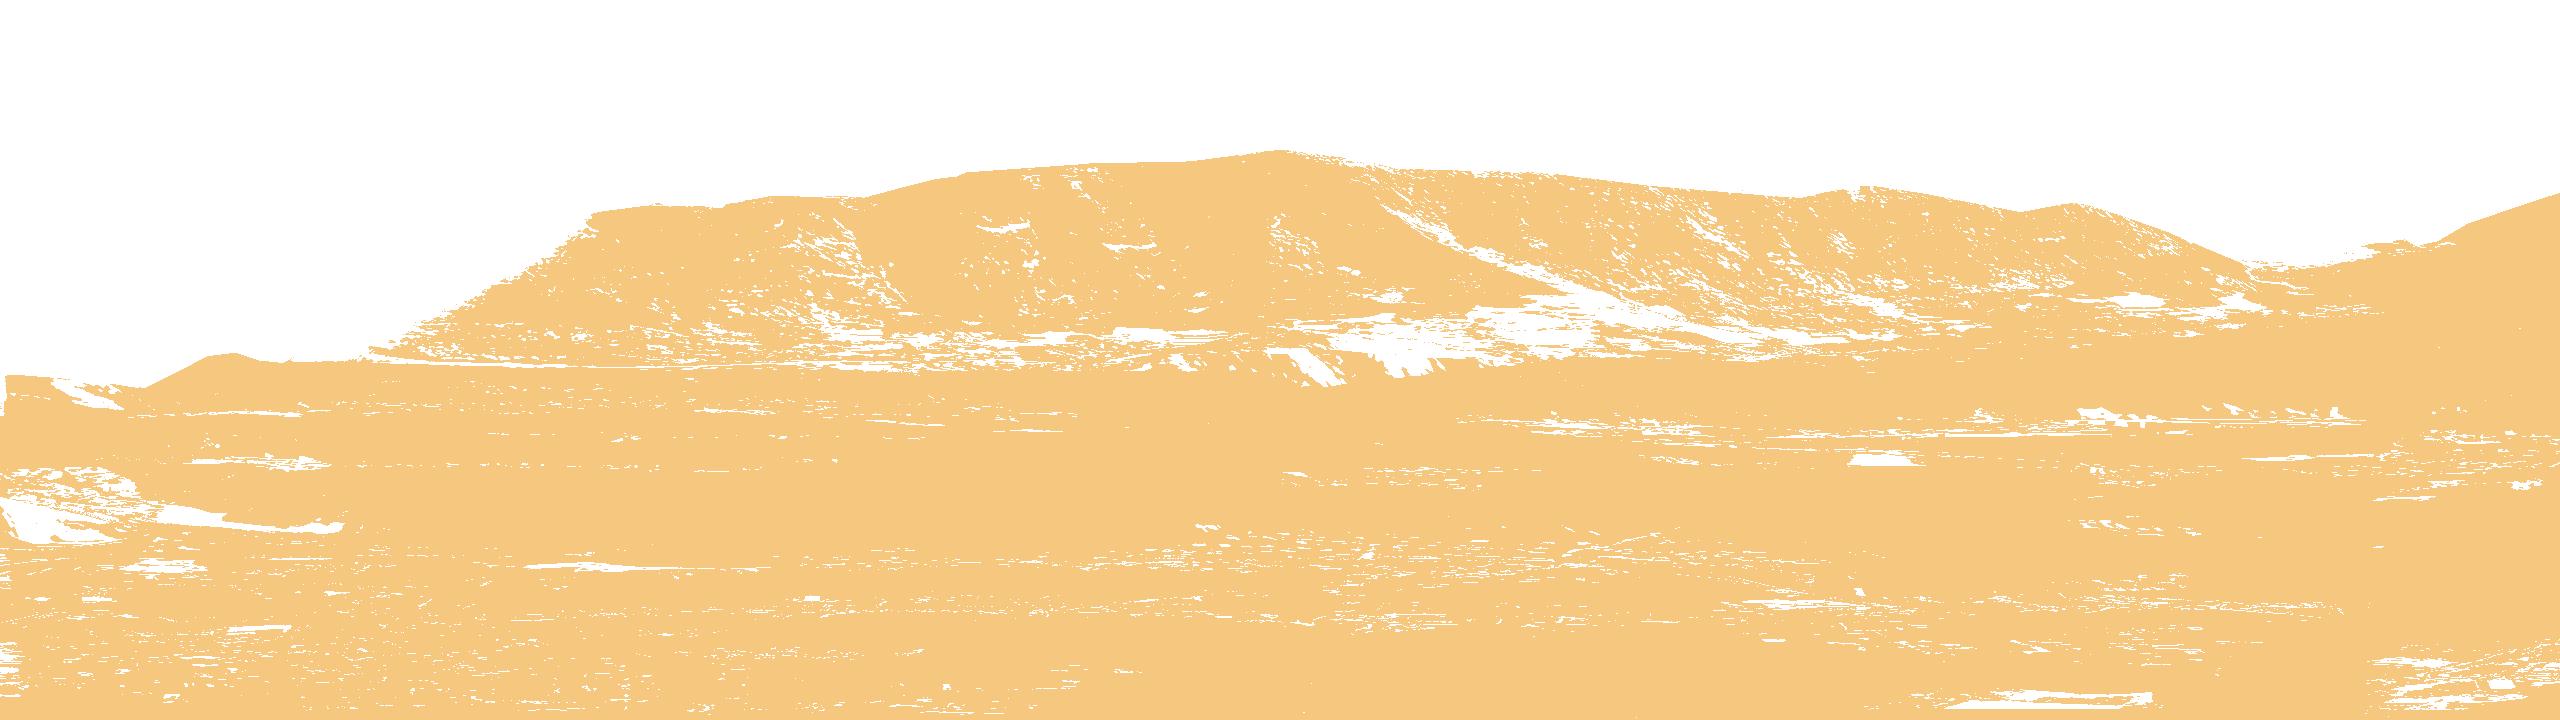 promenade_5